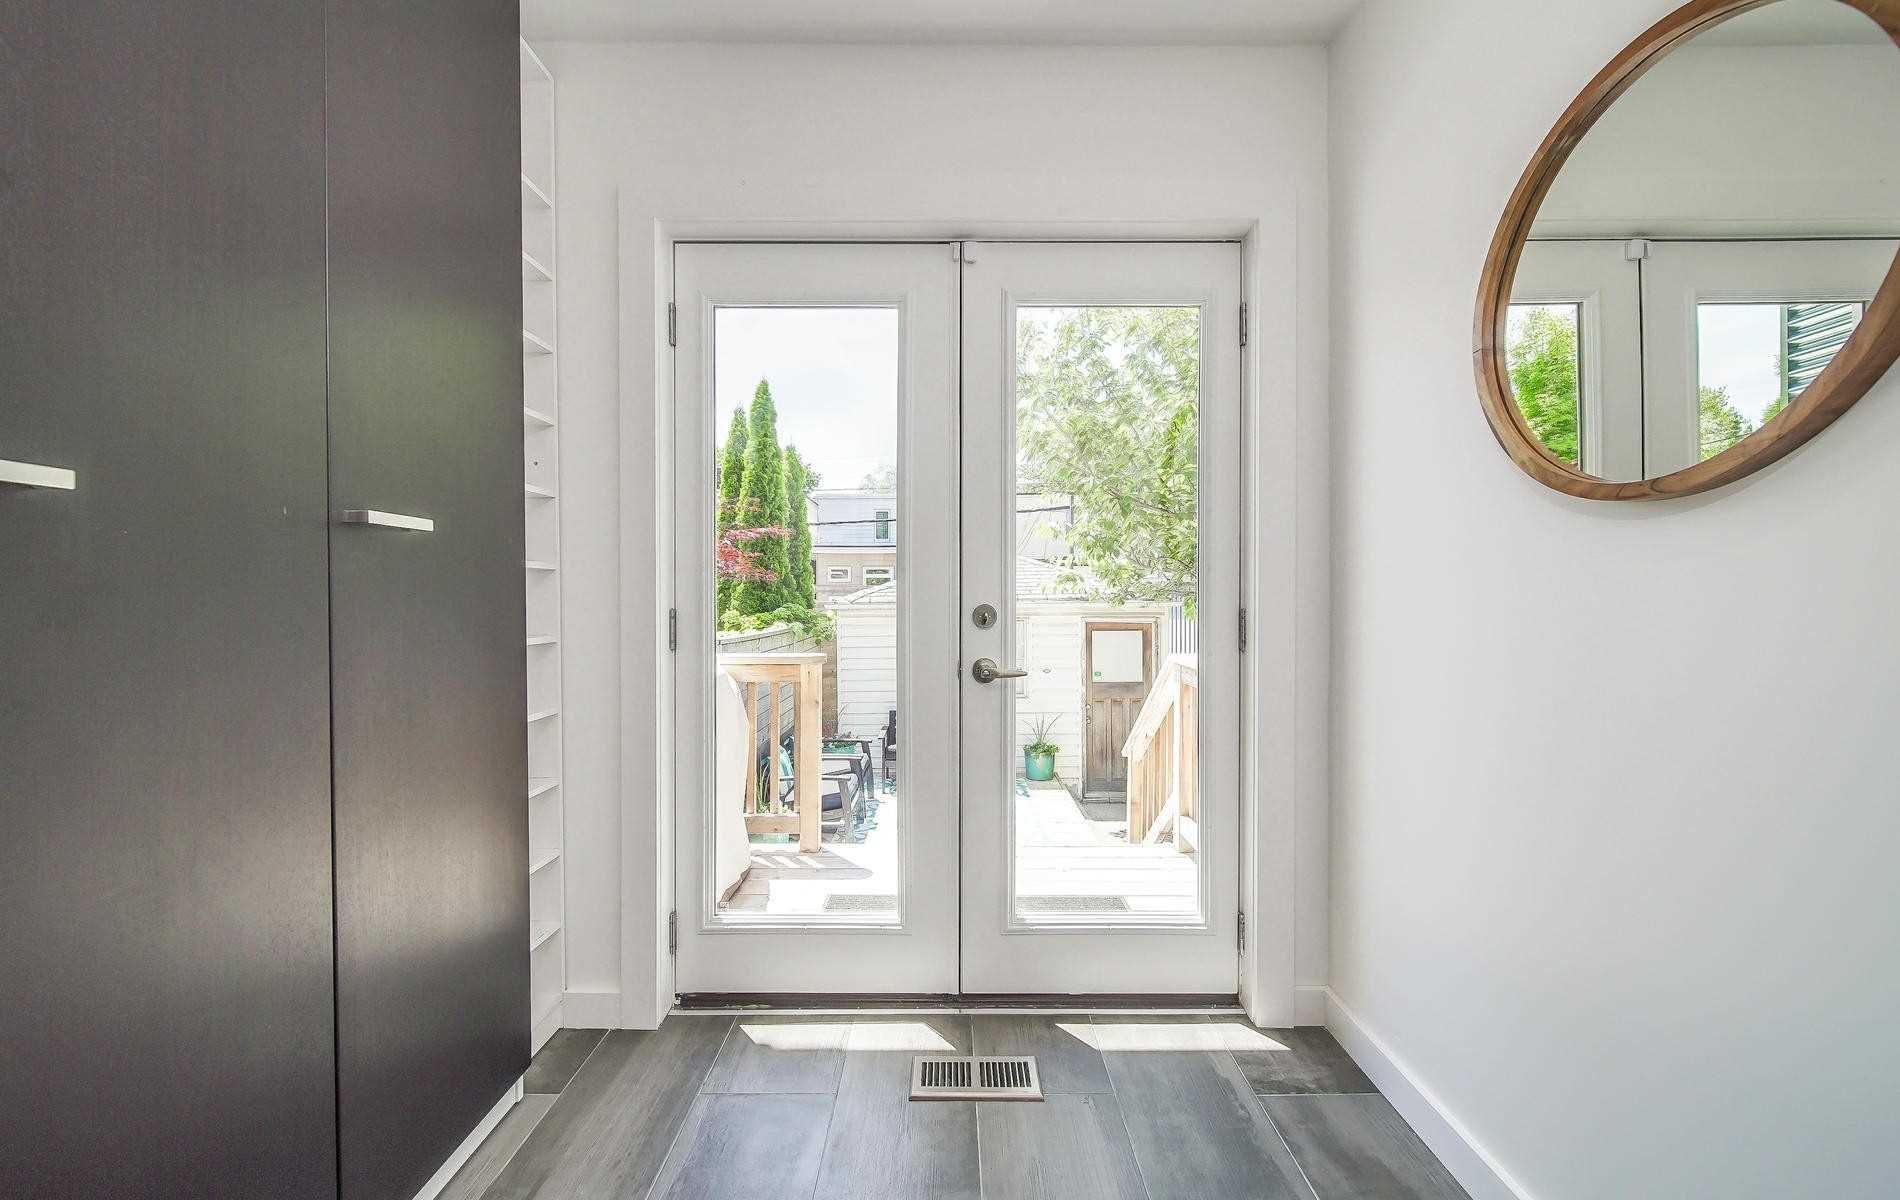 Photo 10: Photos: 64 Larchmount Avenue in Toronto: South Riverdale House (2-Storey) for sale (Toronto E01)  : MLS®# E4489752